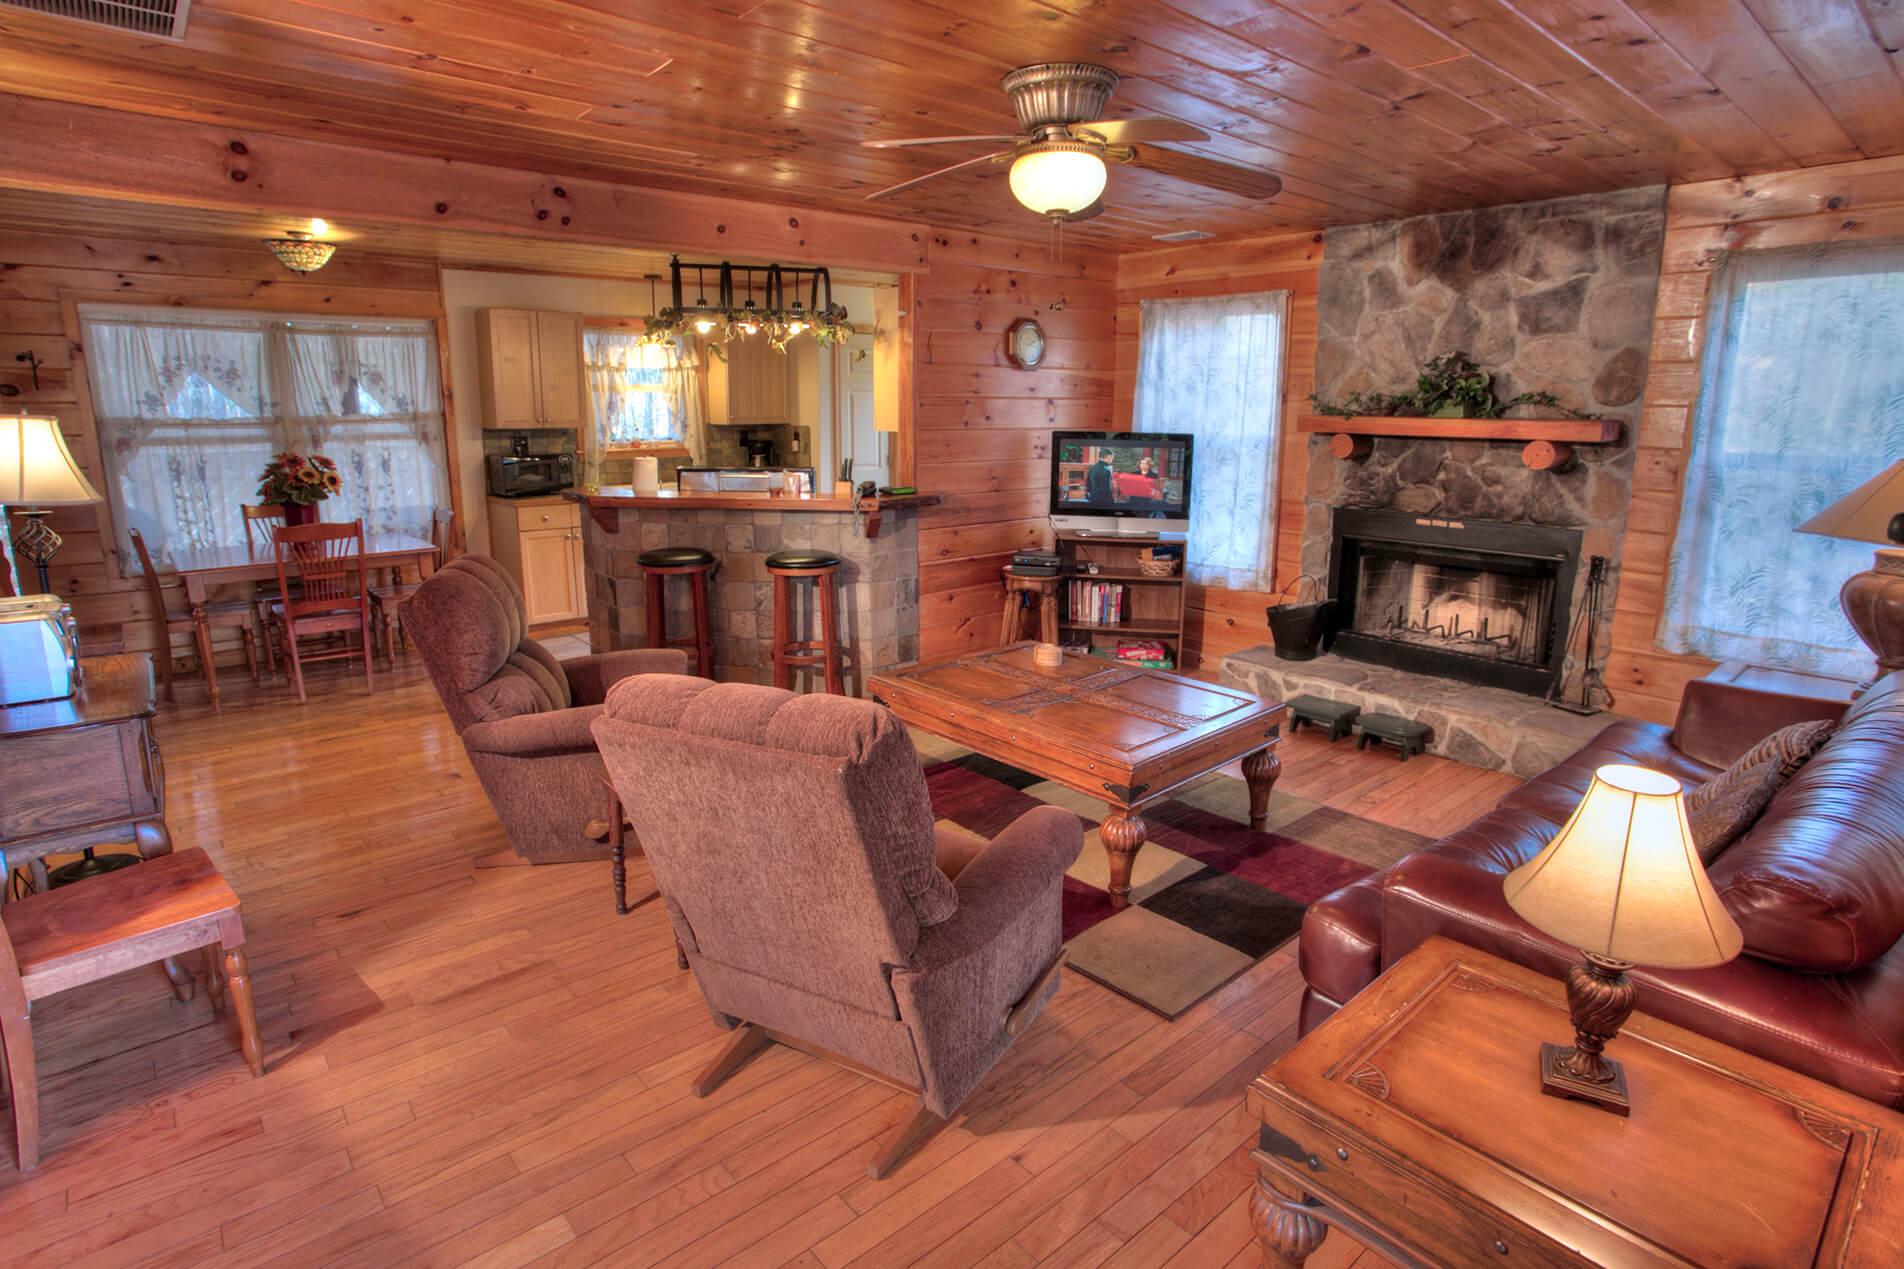 Speckled-Trout-Cedar-Creek-Cabin-Rentals-Helen-Georgia-top-banner-1